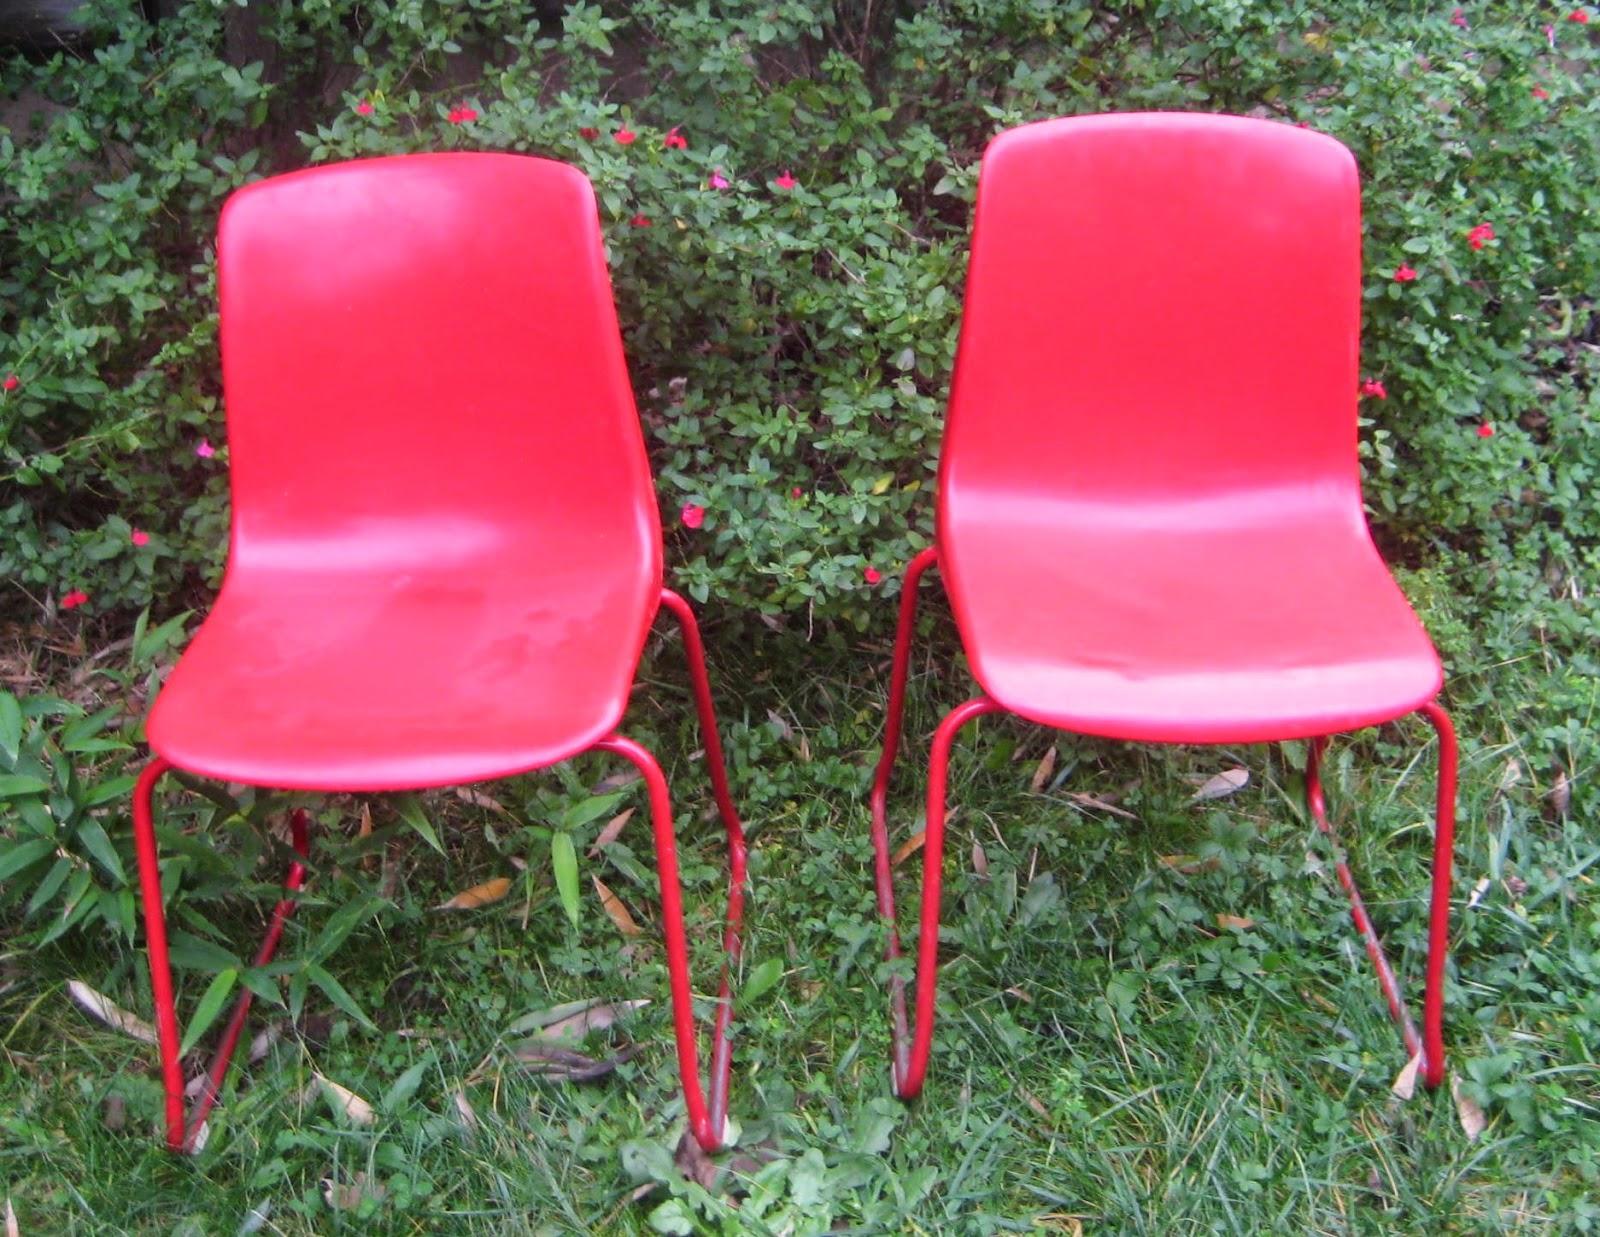 chaise vintage grosfillex rouge n 6001 les enfants de la brocante. Black Bedroom Furniture Sets. Home Design Ideas